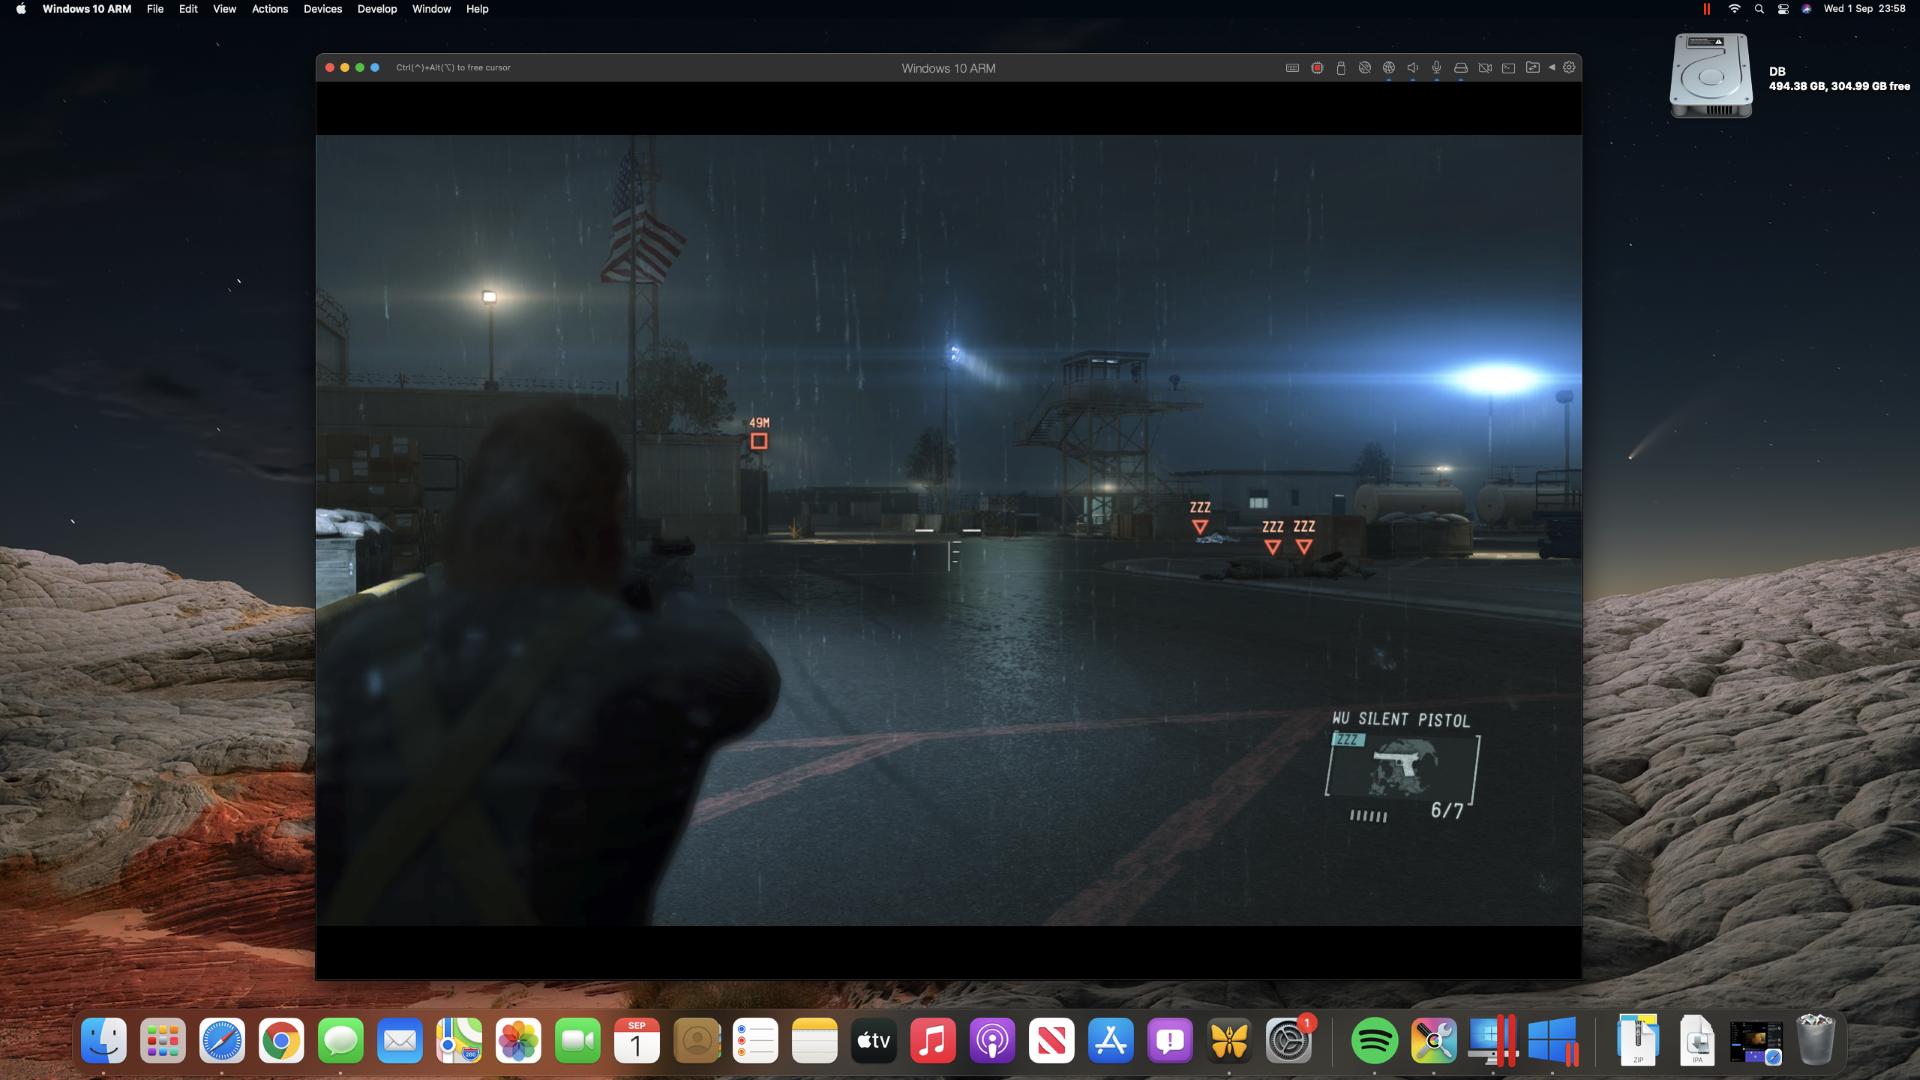 Metal Gear Solid V: Ground Zeroes en una Mac mini M1 a través de Steam